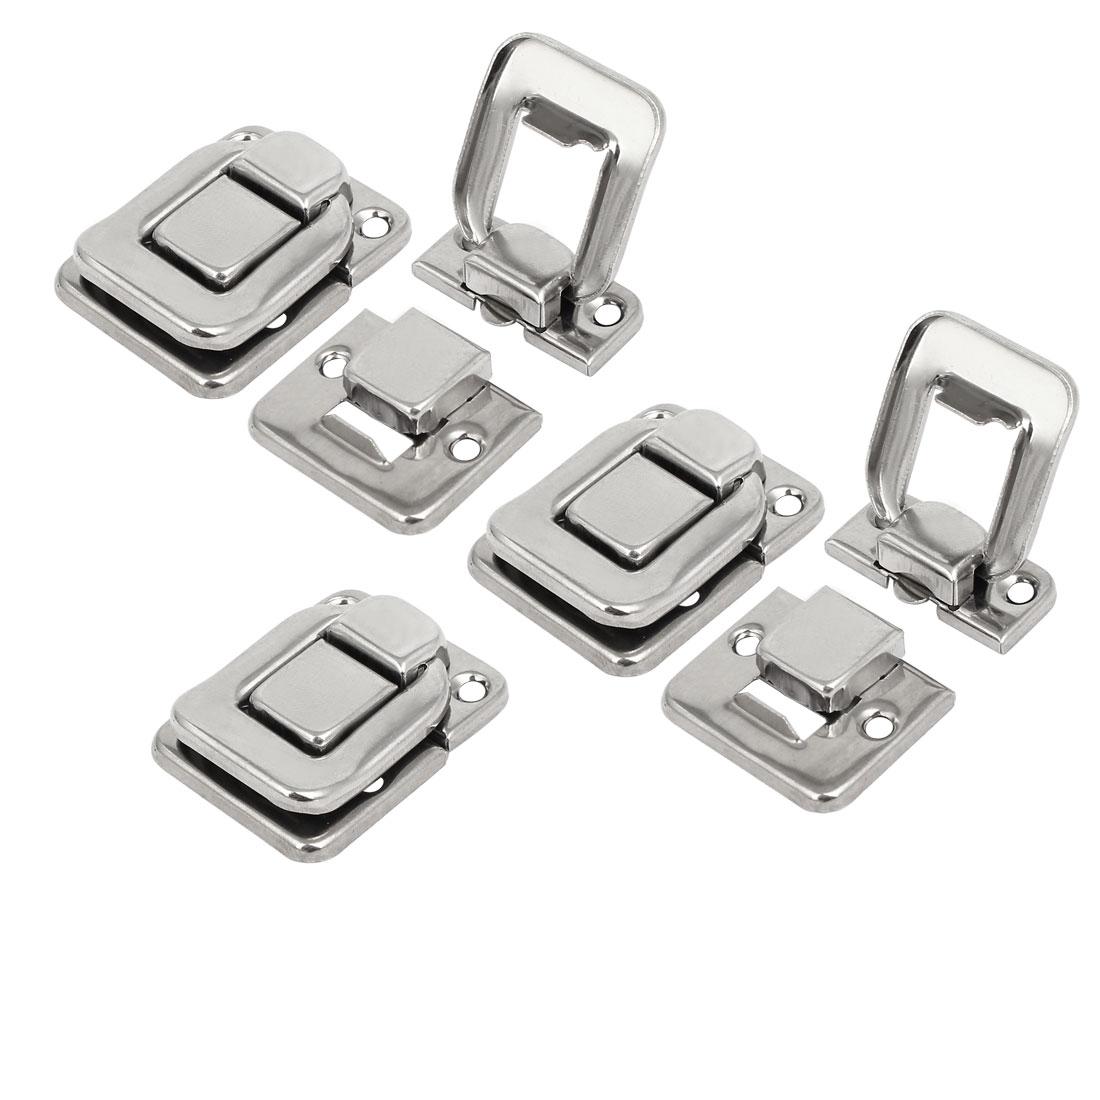 38mmx29mmx8mm Latches Hasps Locks Silver Tone 5pcs for Toolbox Jewelry Box